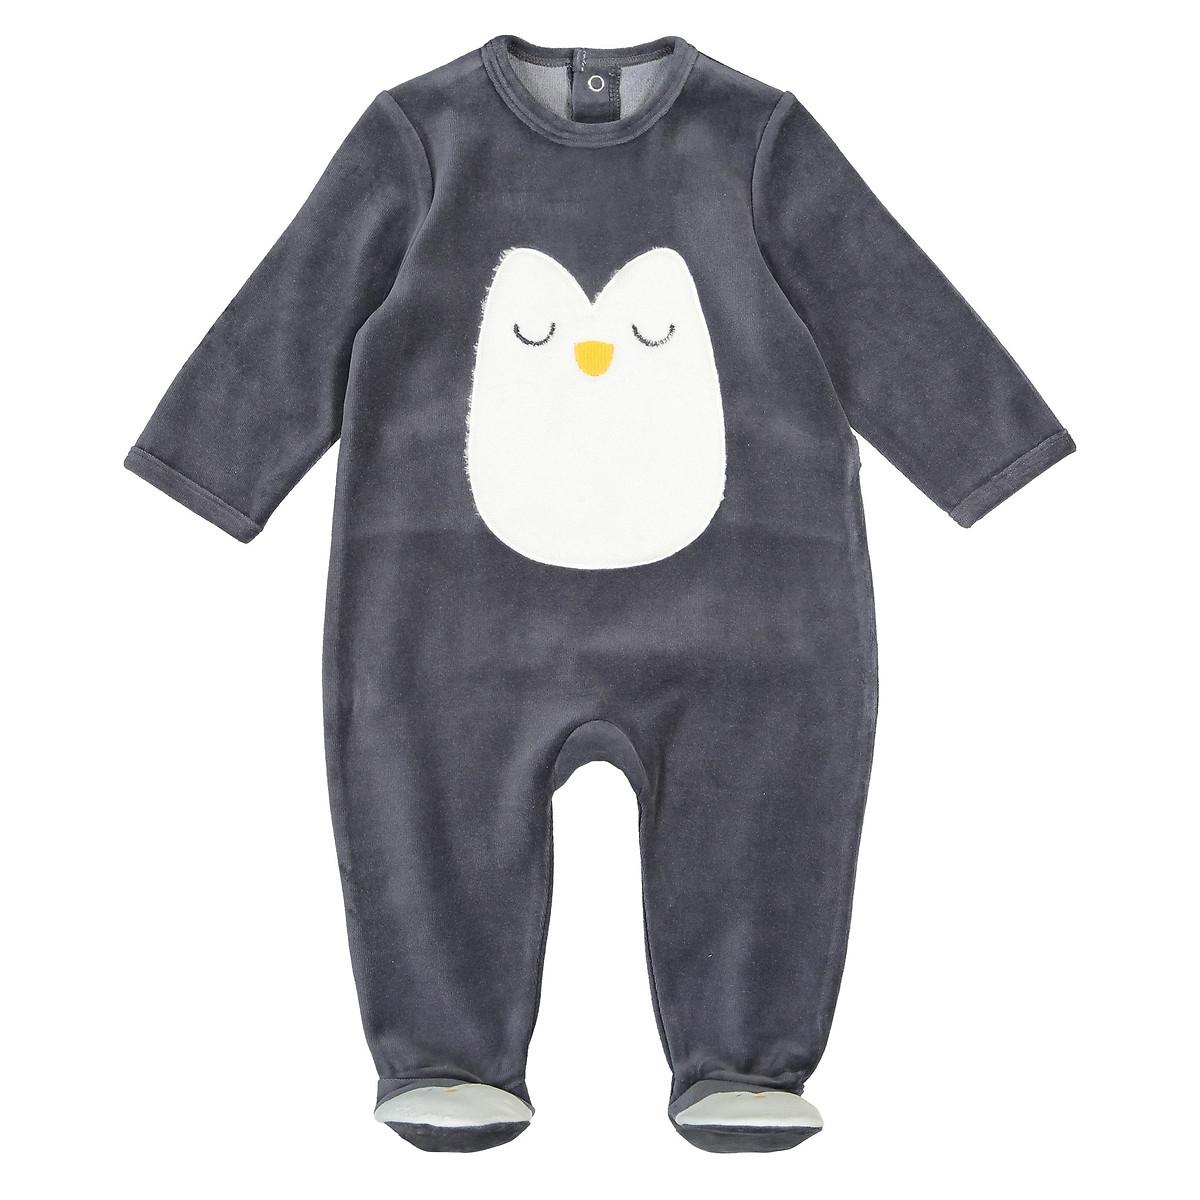 Пижама LaRedoute С носочками из велюра 0 мес - 3 года 0 мес. - 50 см серый пижама laredoute с носочками из велюра 0 мес 3 года 3 мес 60 см серый